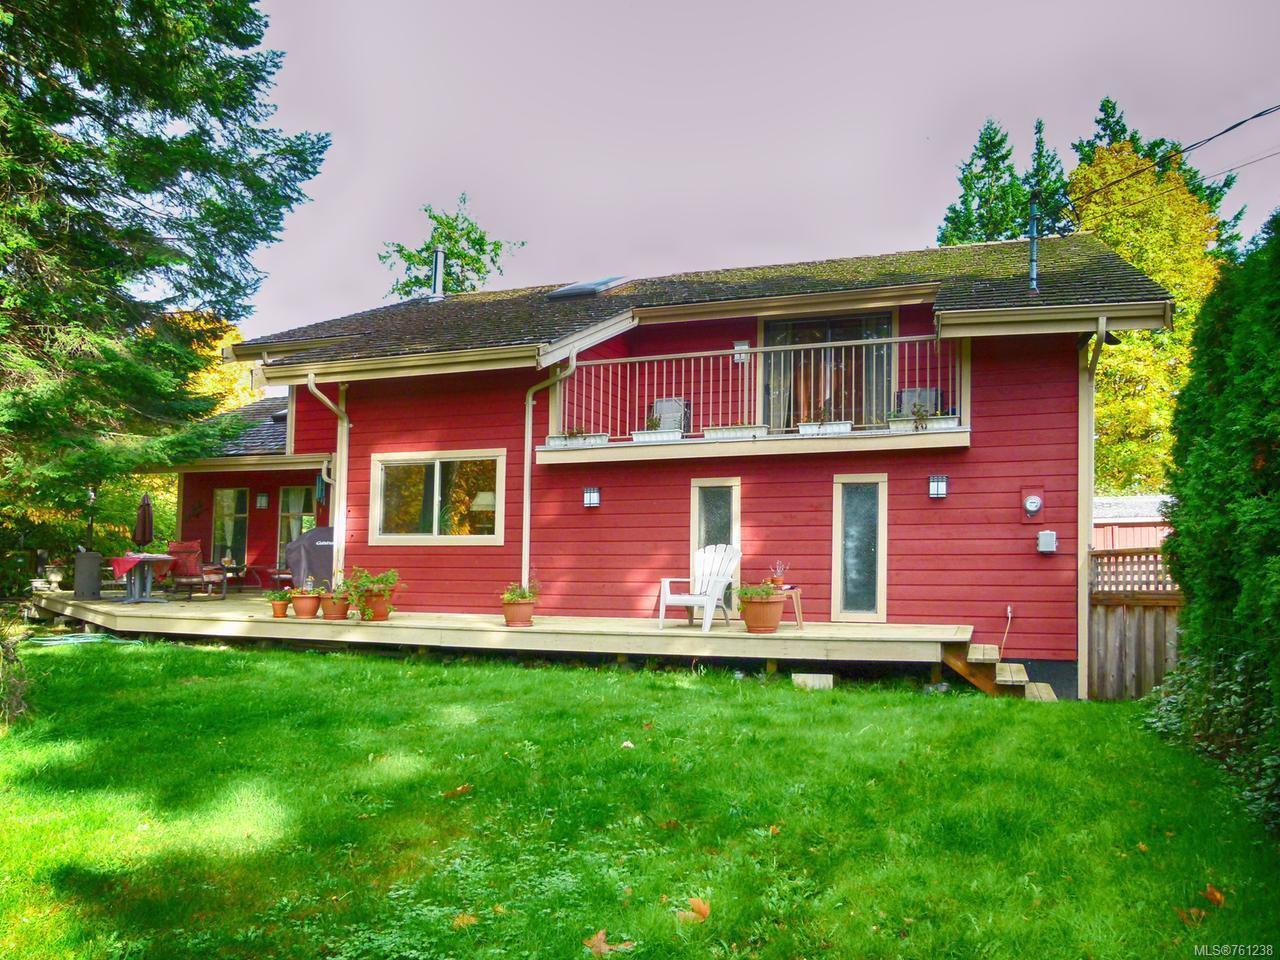 Main Photo: 4251 Glendinning Dr in CAMPBELL RIVER: CR Campbell River North House for sale (Campbell River)  : MLS®# 761238